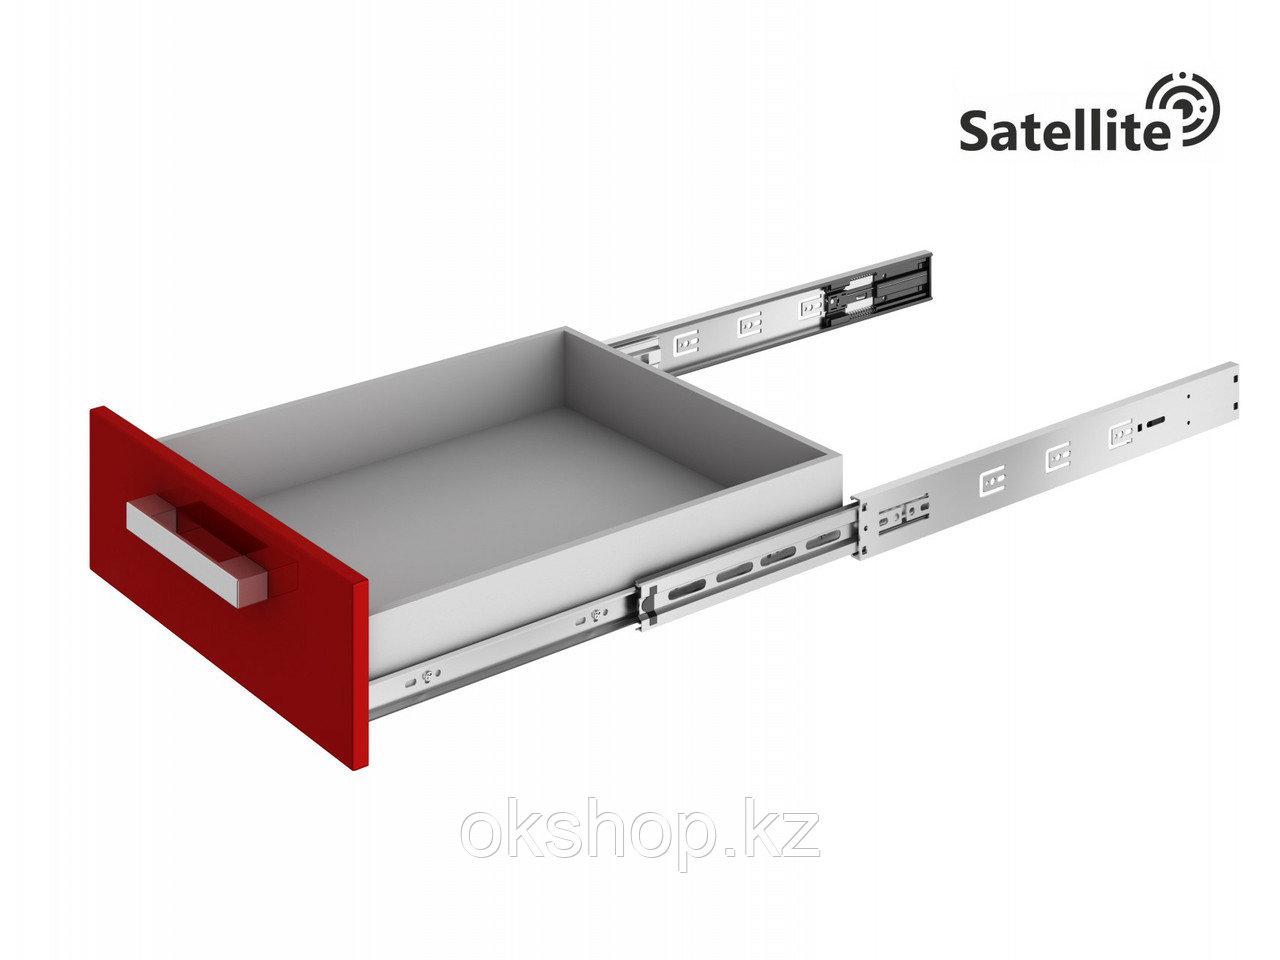 Шариковые направляющие Satellite DB4505Zn/450